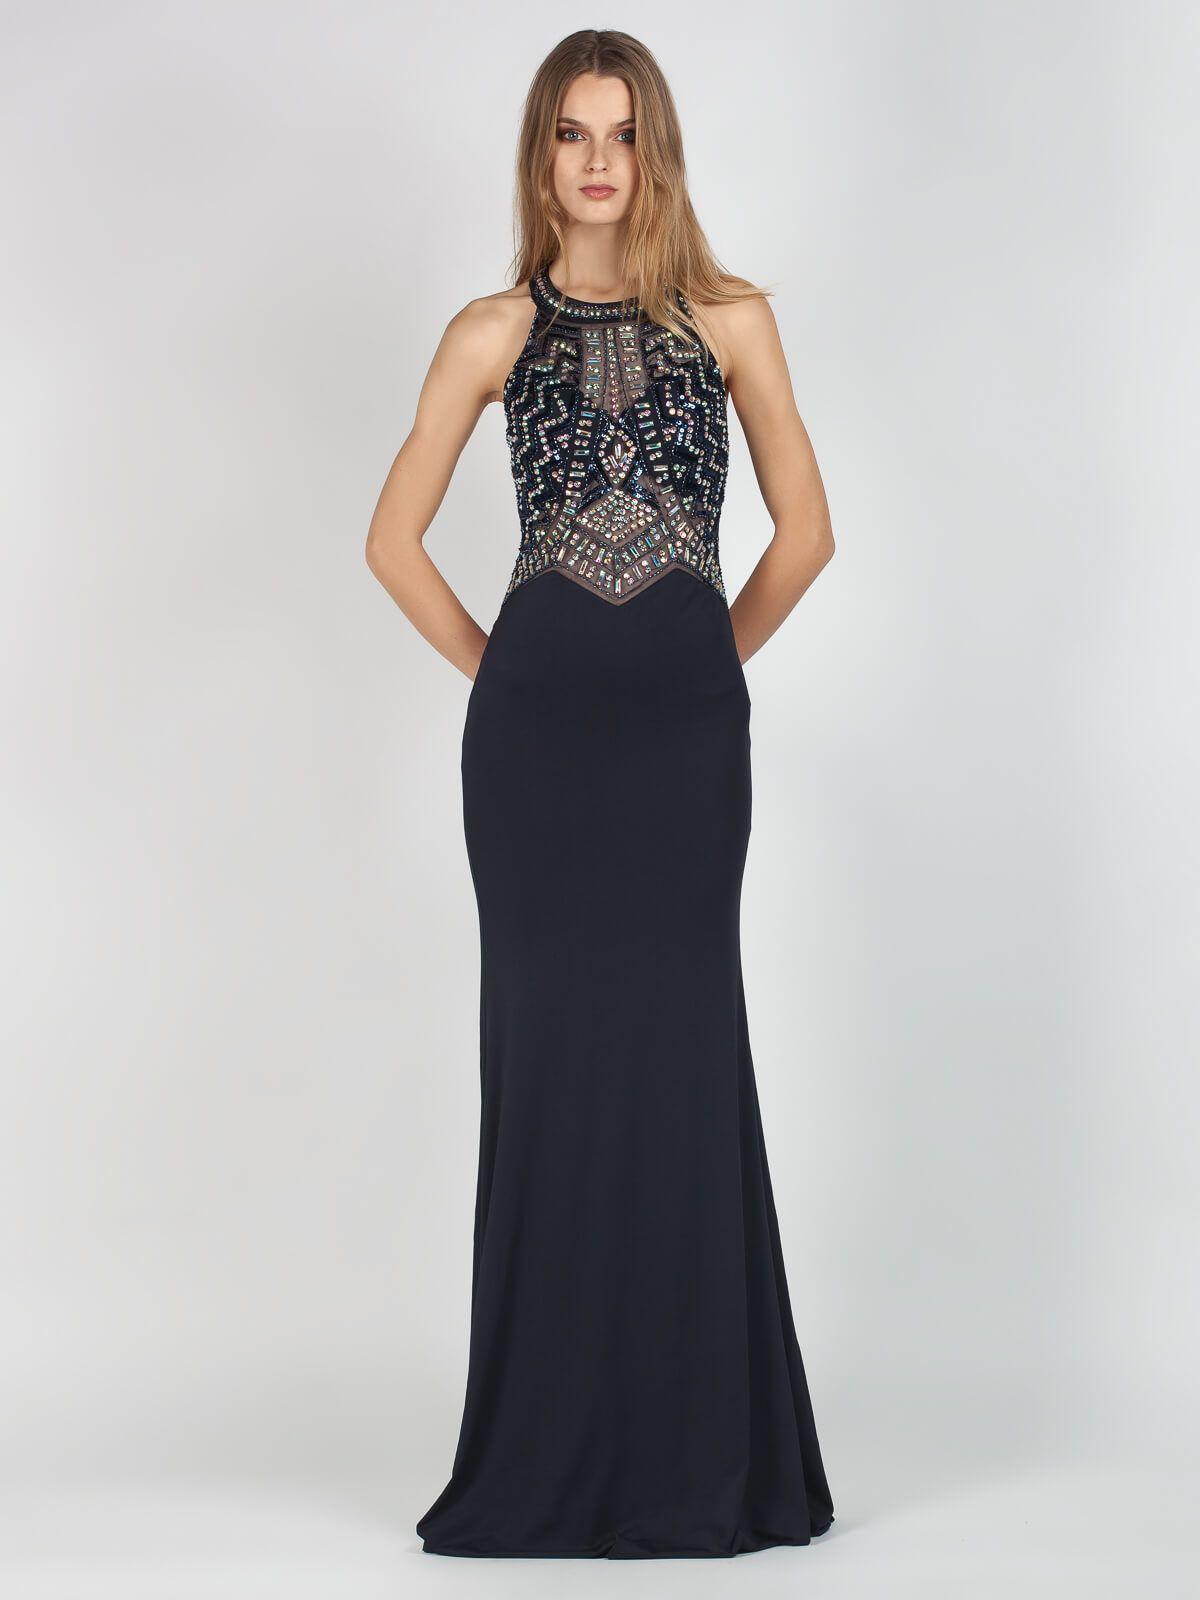 b8d388923d21 Βραδινό μάξι φόρεμα με εντυπωσιακό μπούστο